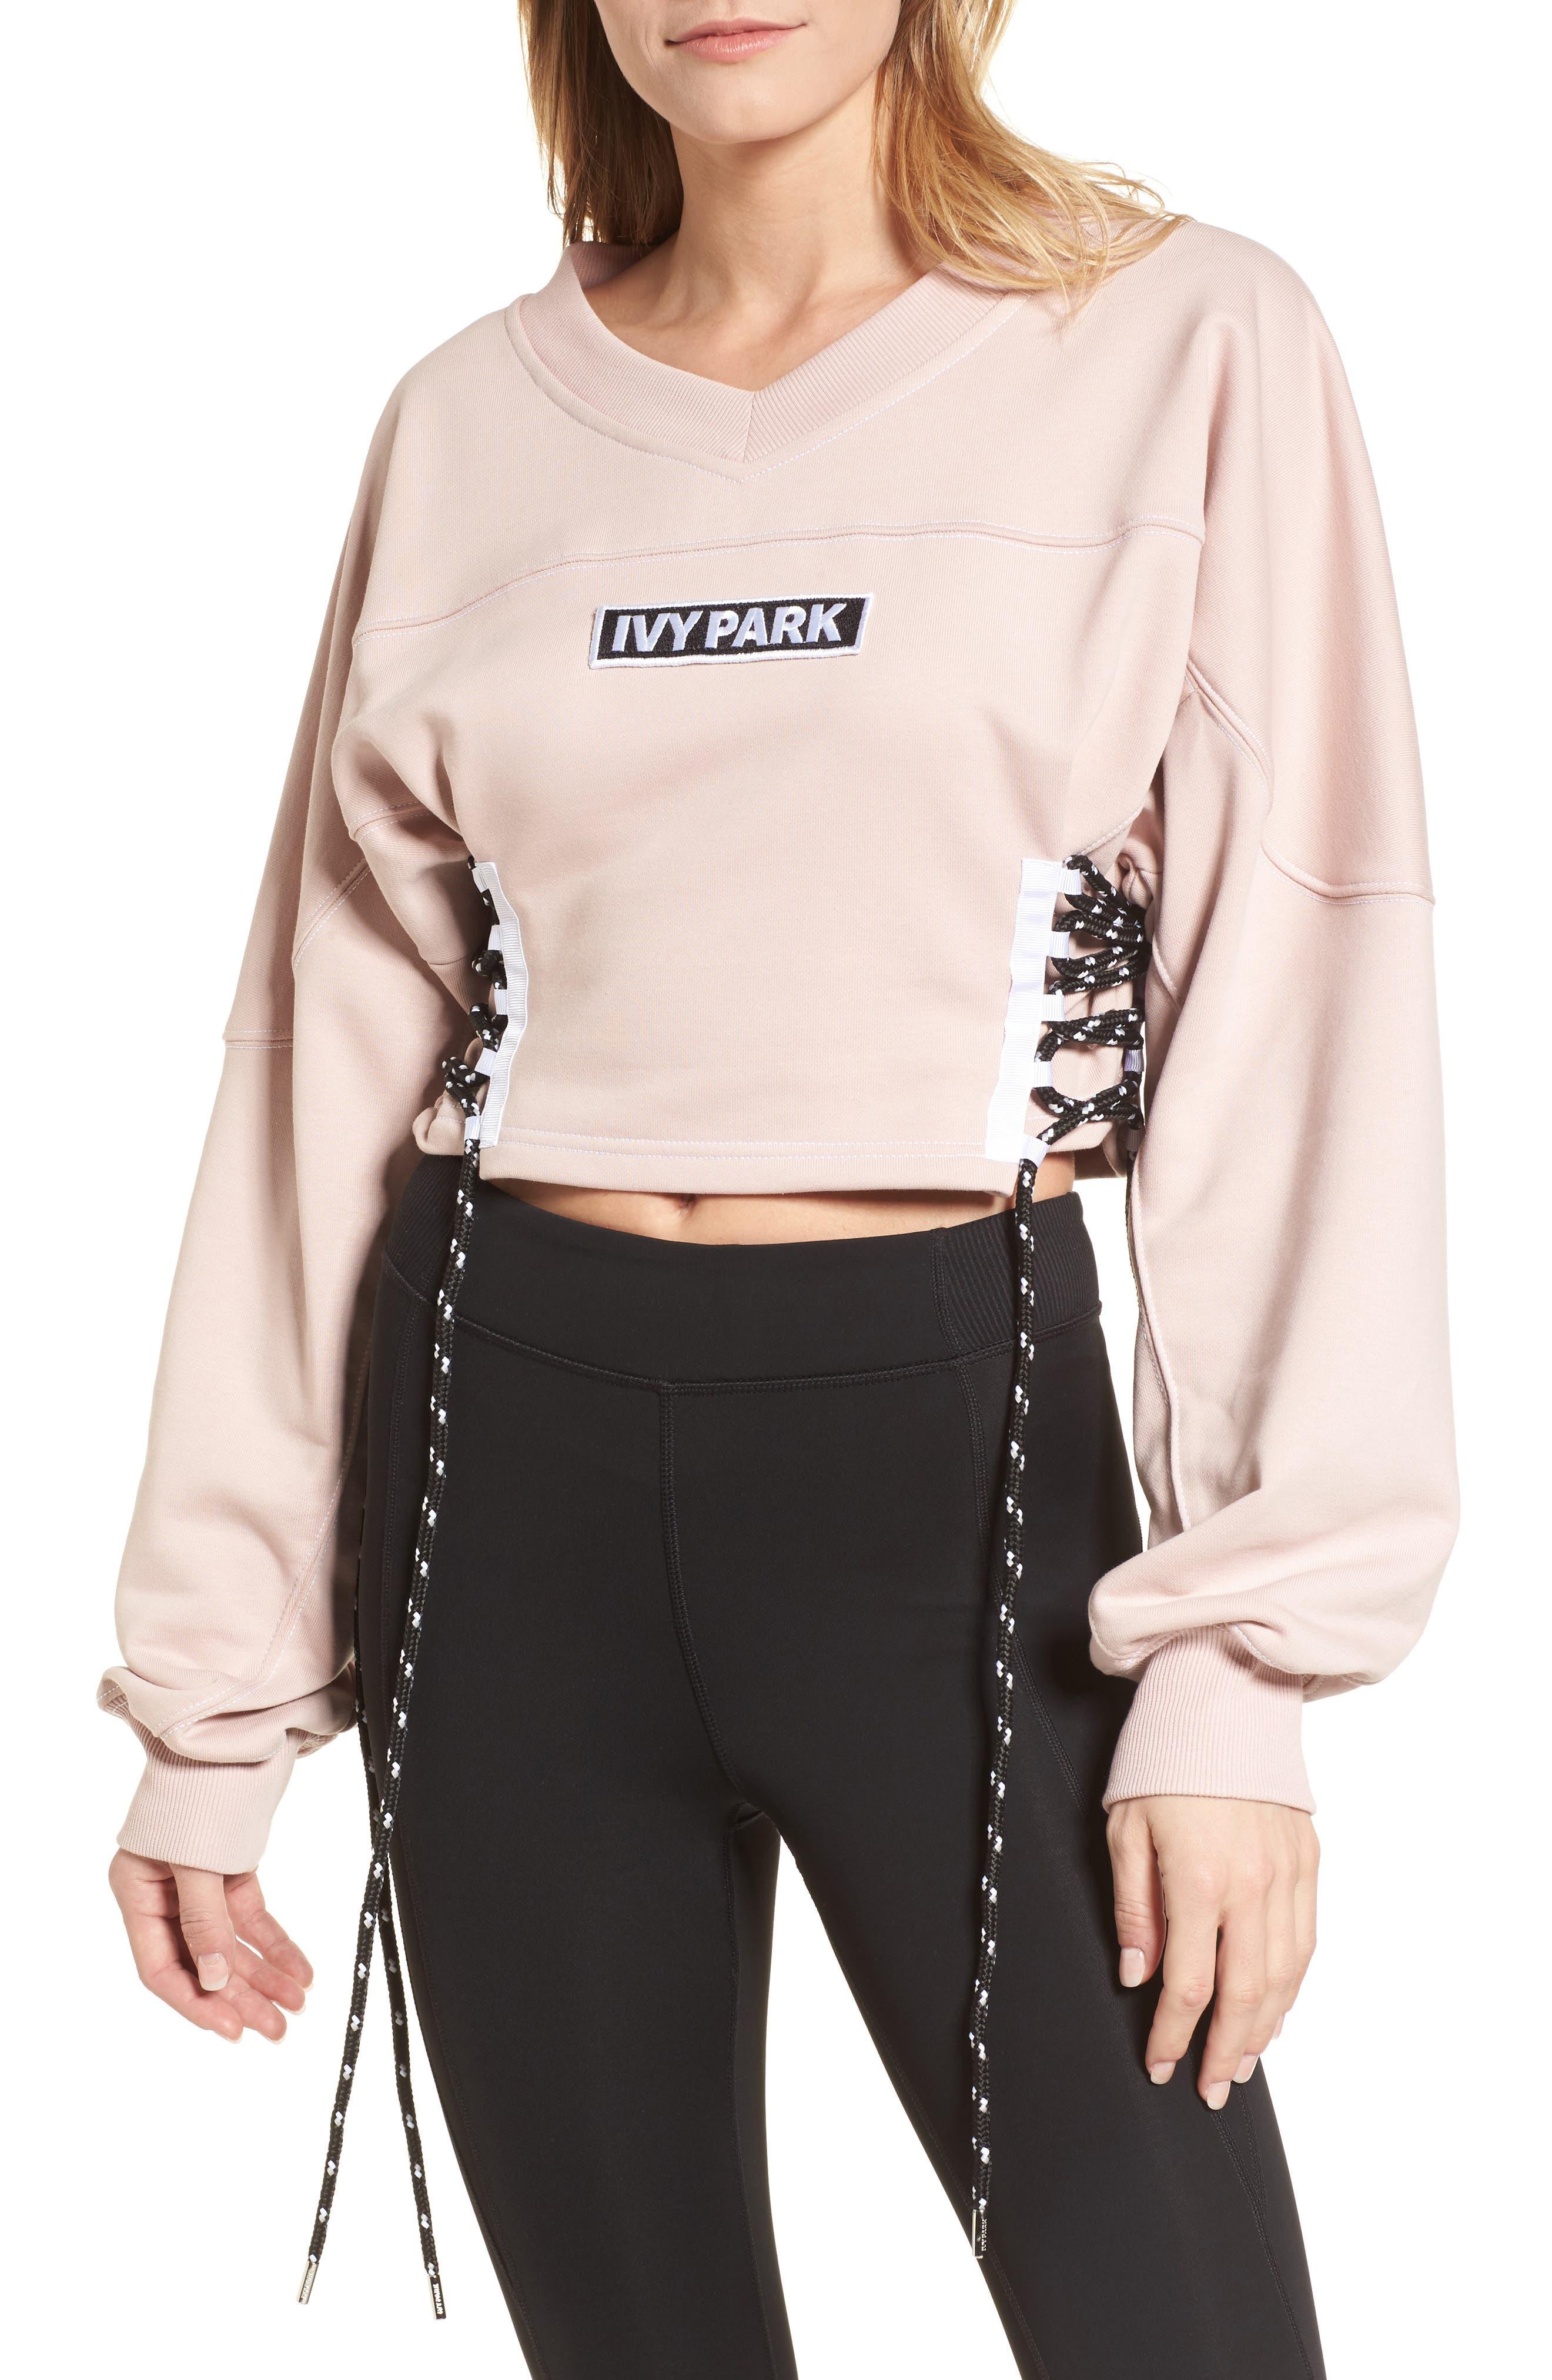 IVY PARK® Football Lace-Up Sweatshirt